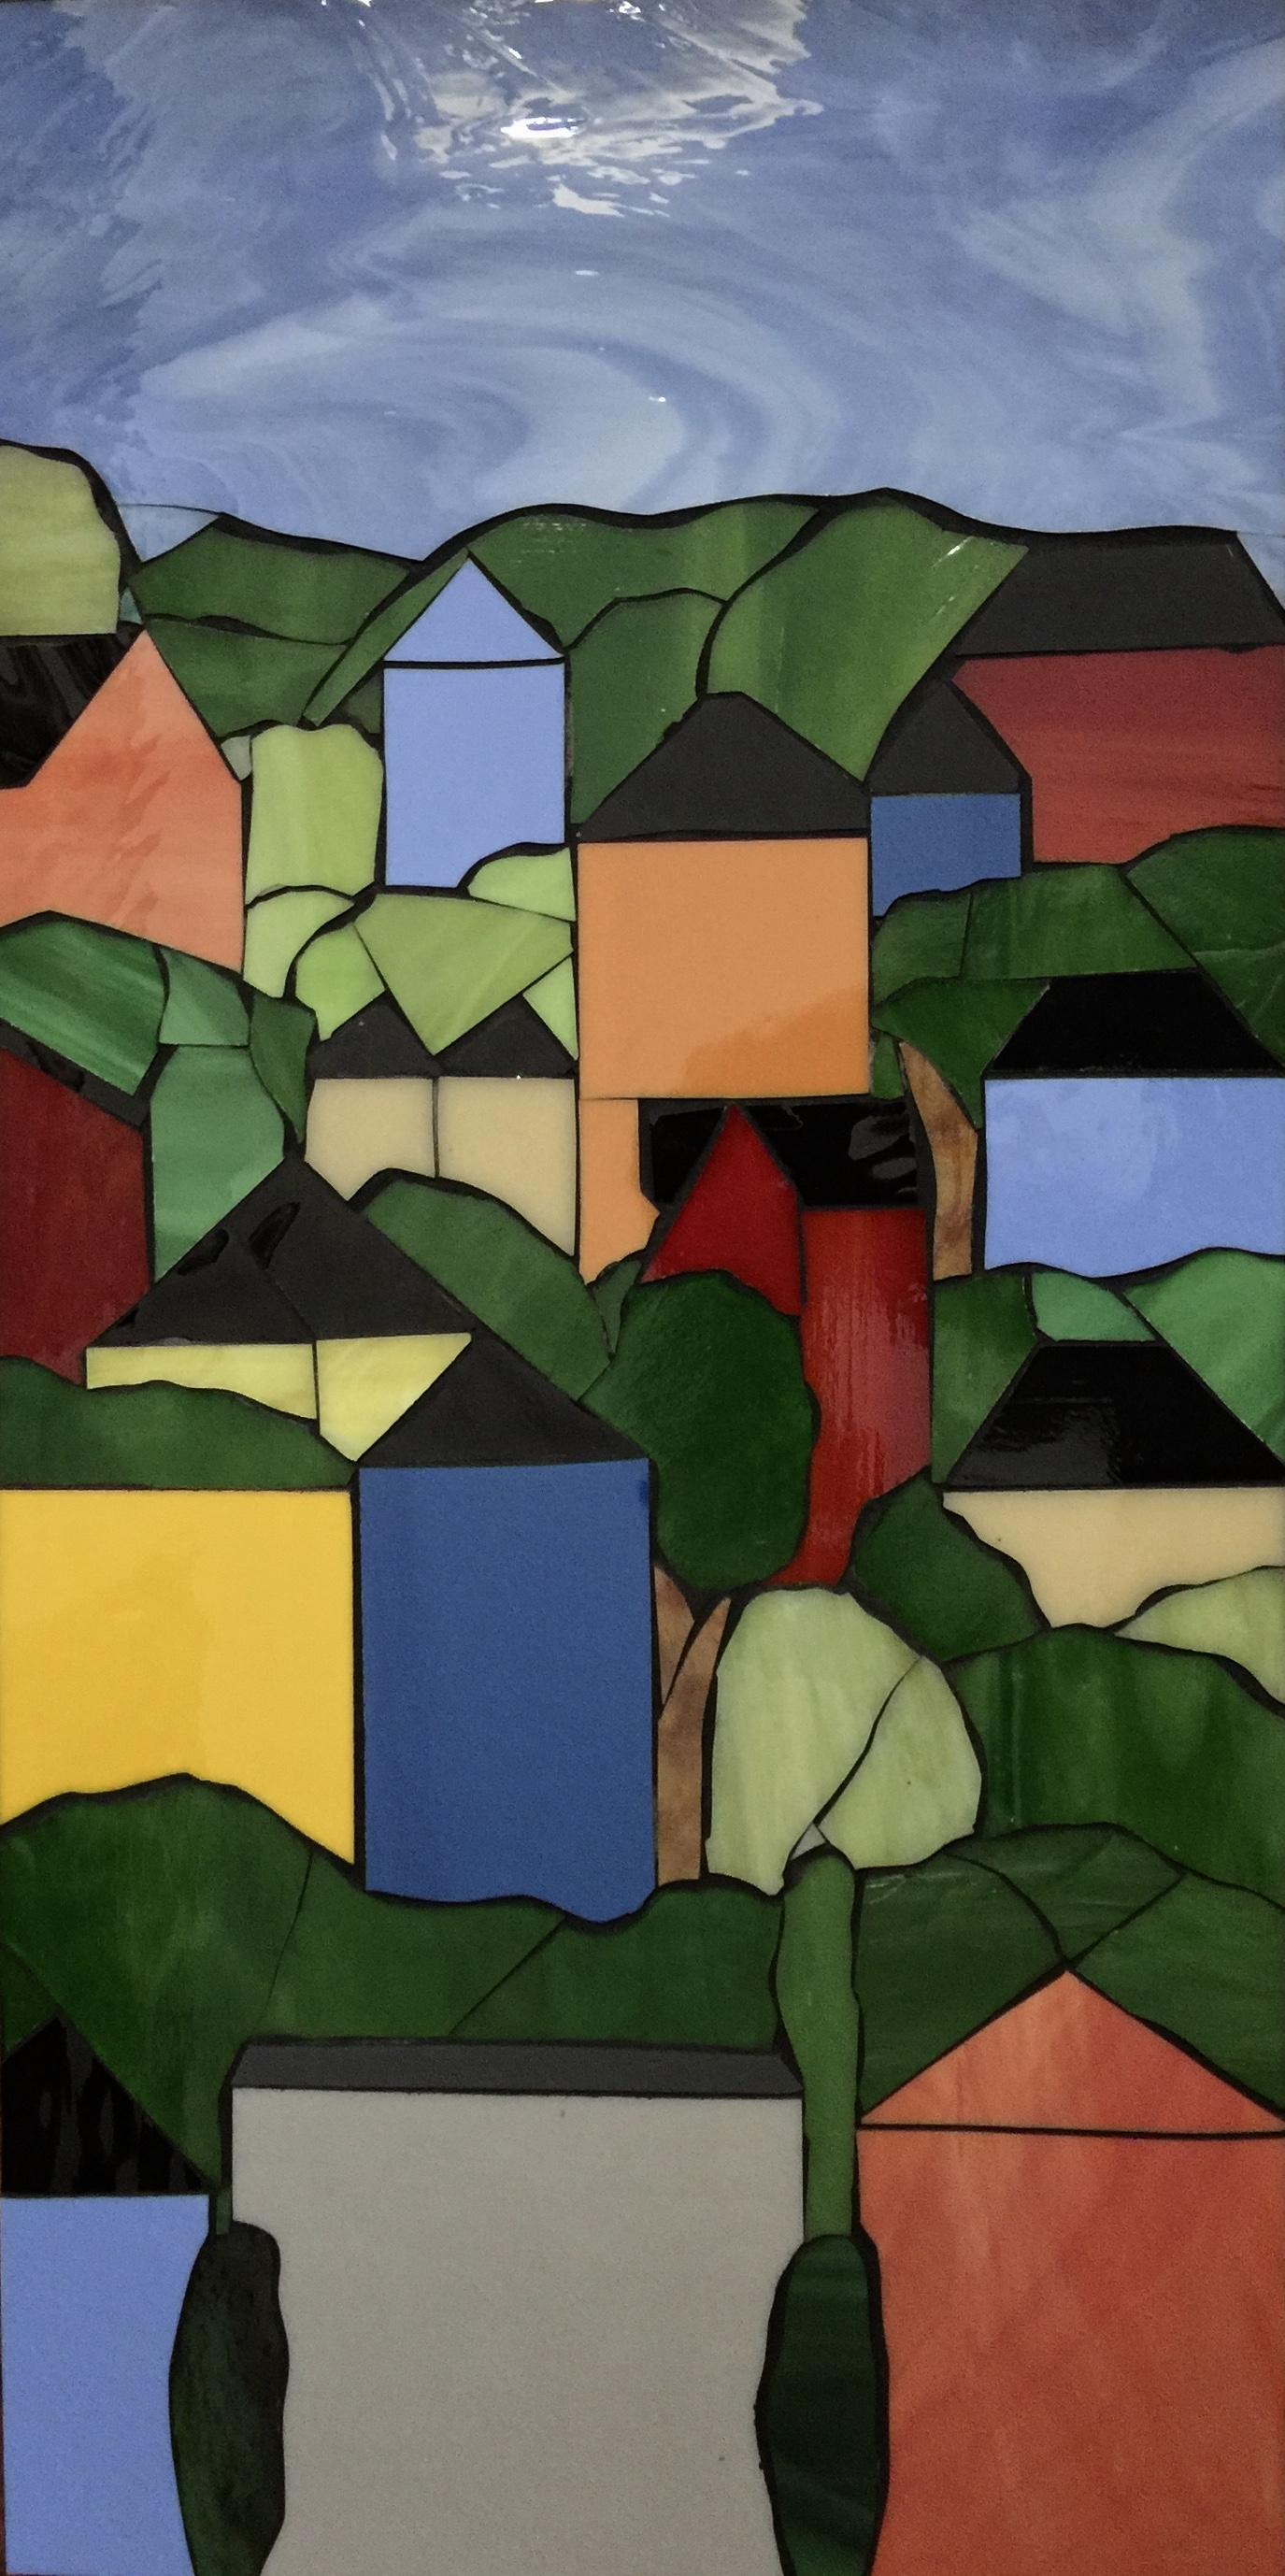 Tree Top Houses